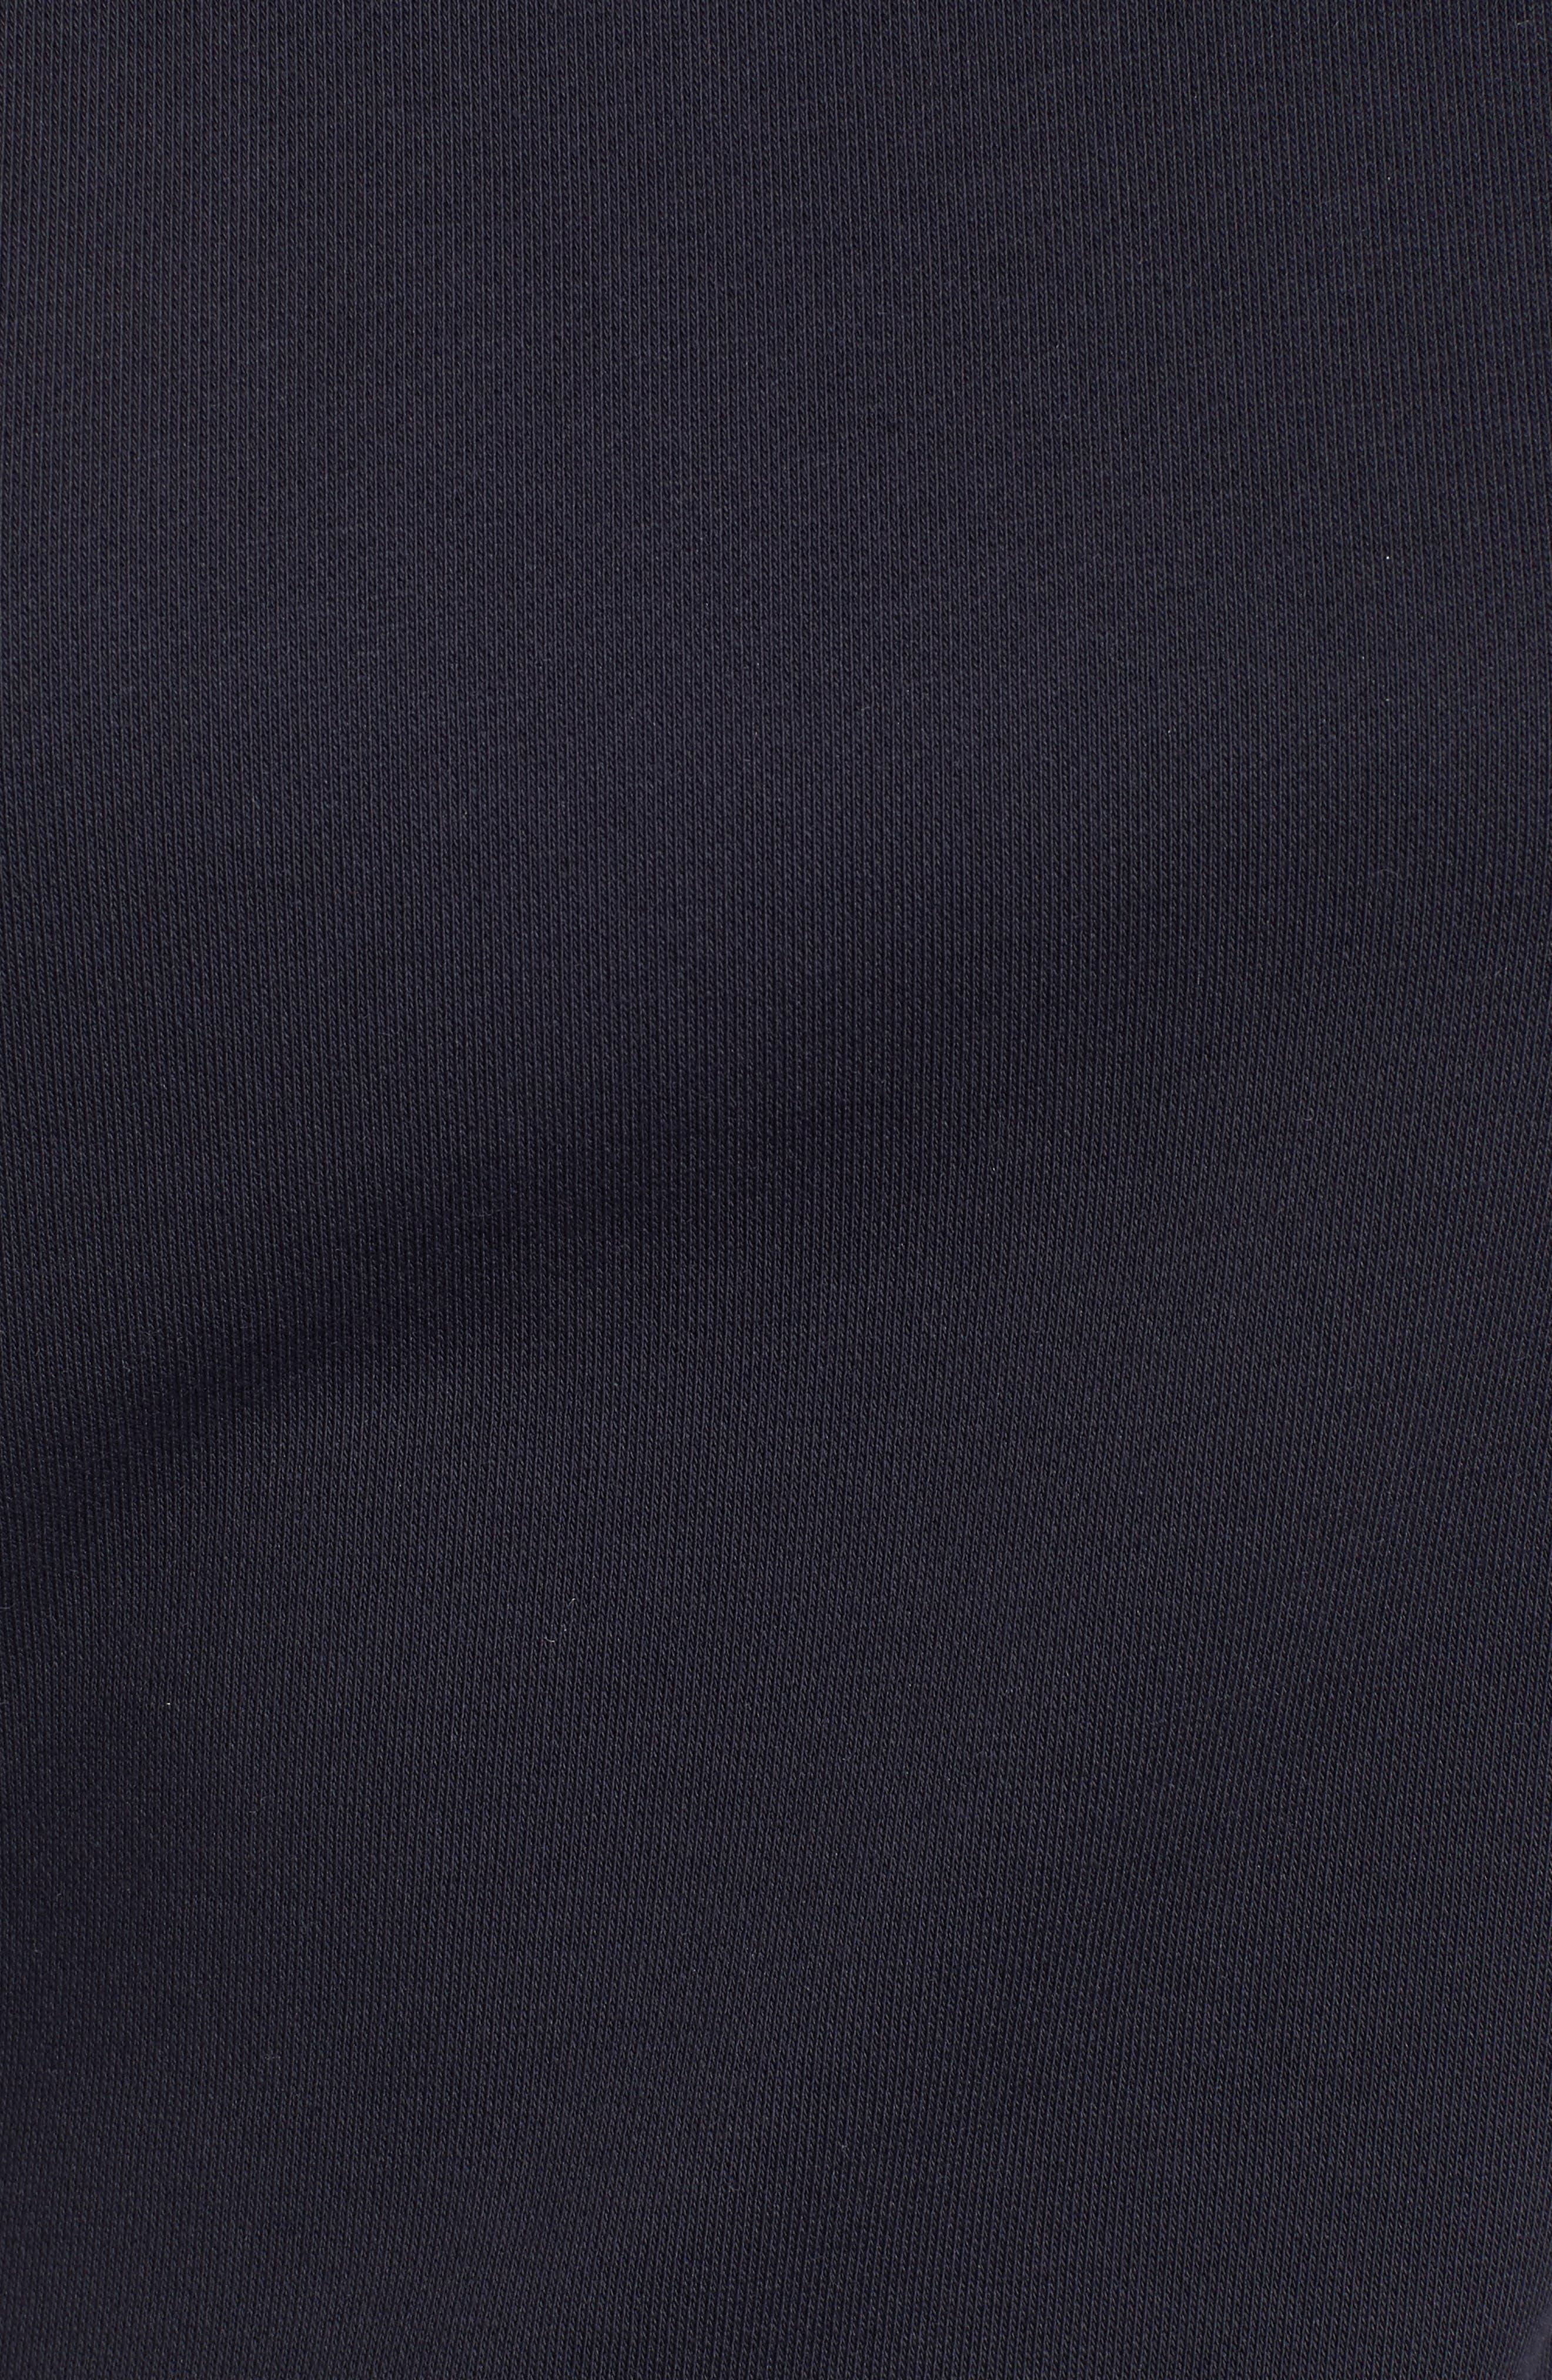 Bow Sleeve Sweatshirt,                             Alternate thumbnail 10, color,